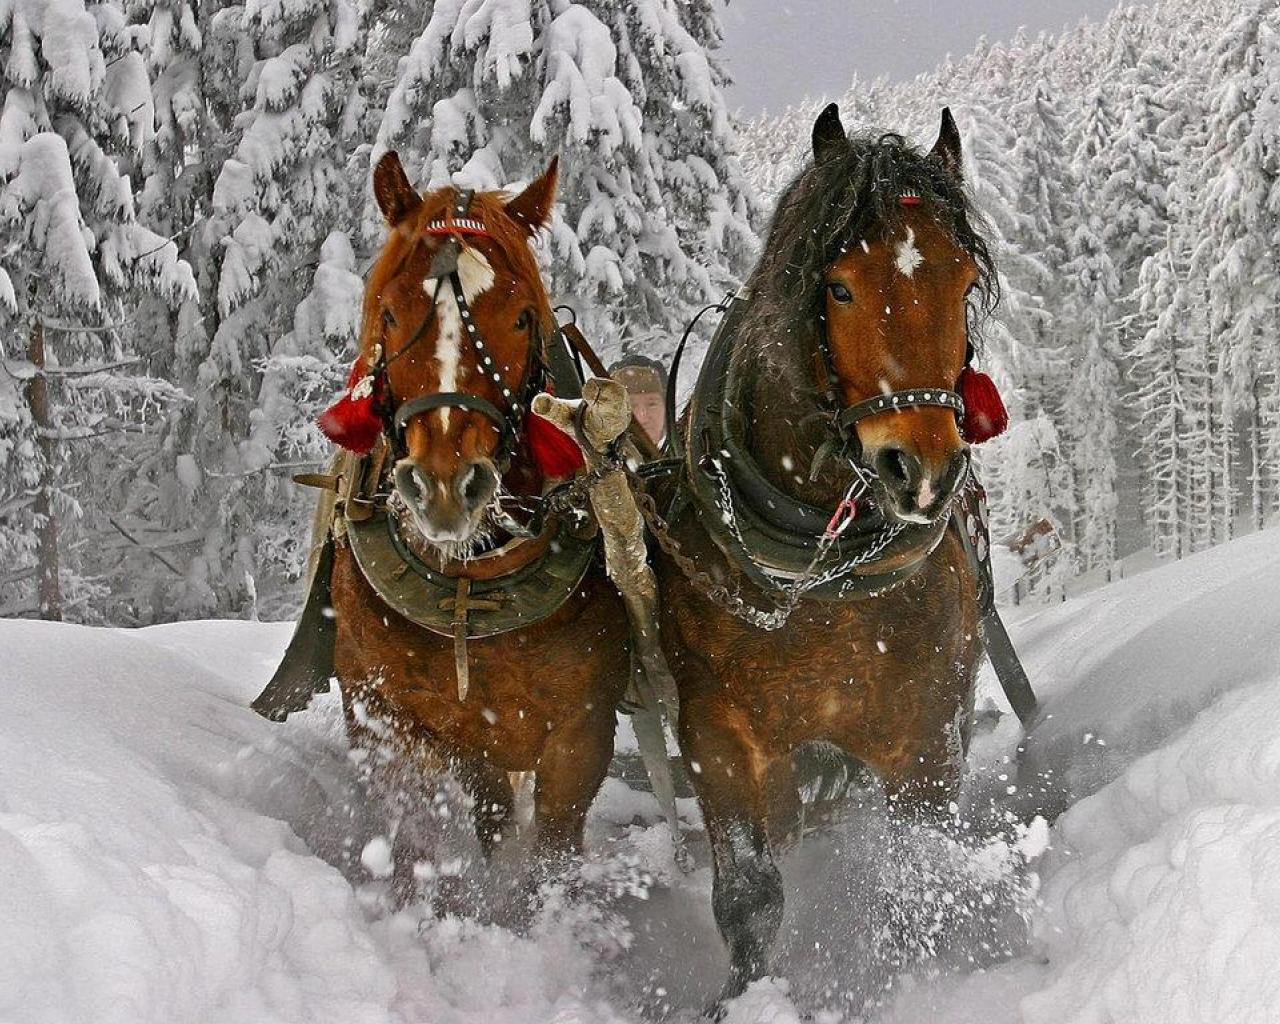 christmas sleigh horses 1920x1080 wallpaper - photo #2